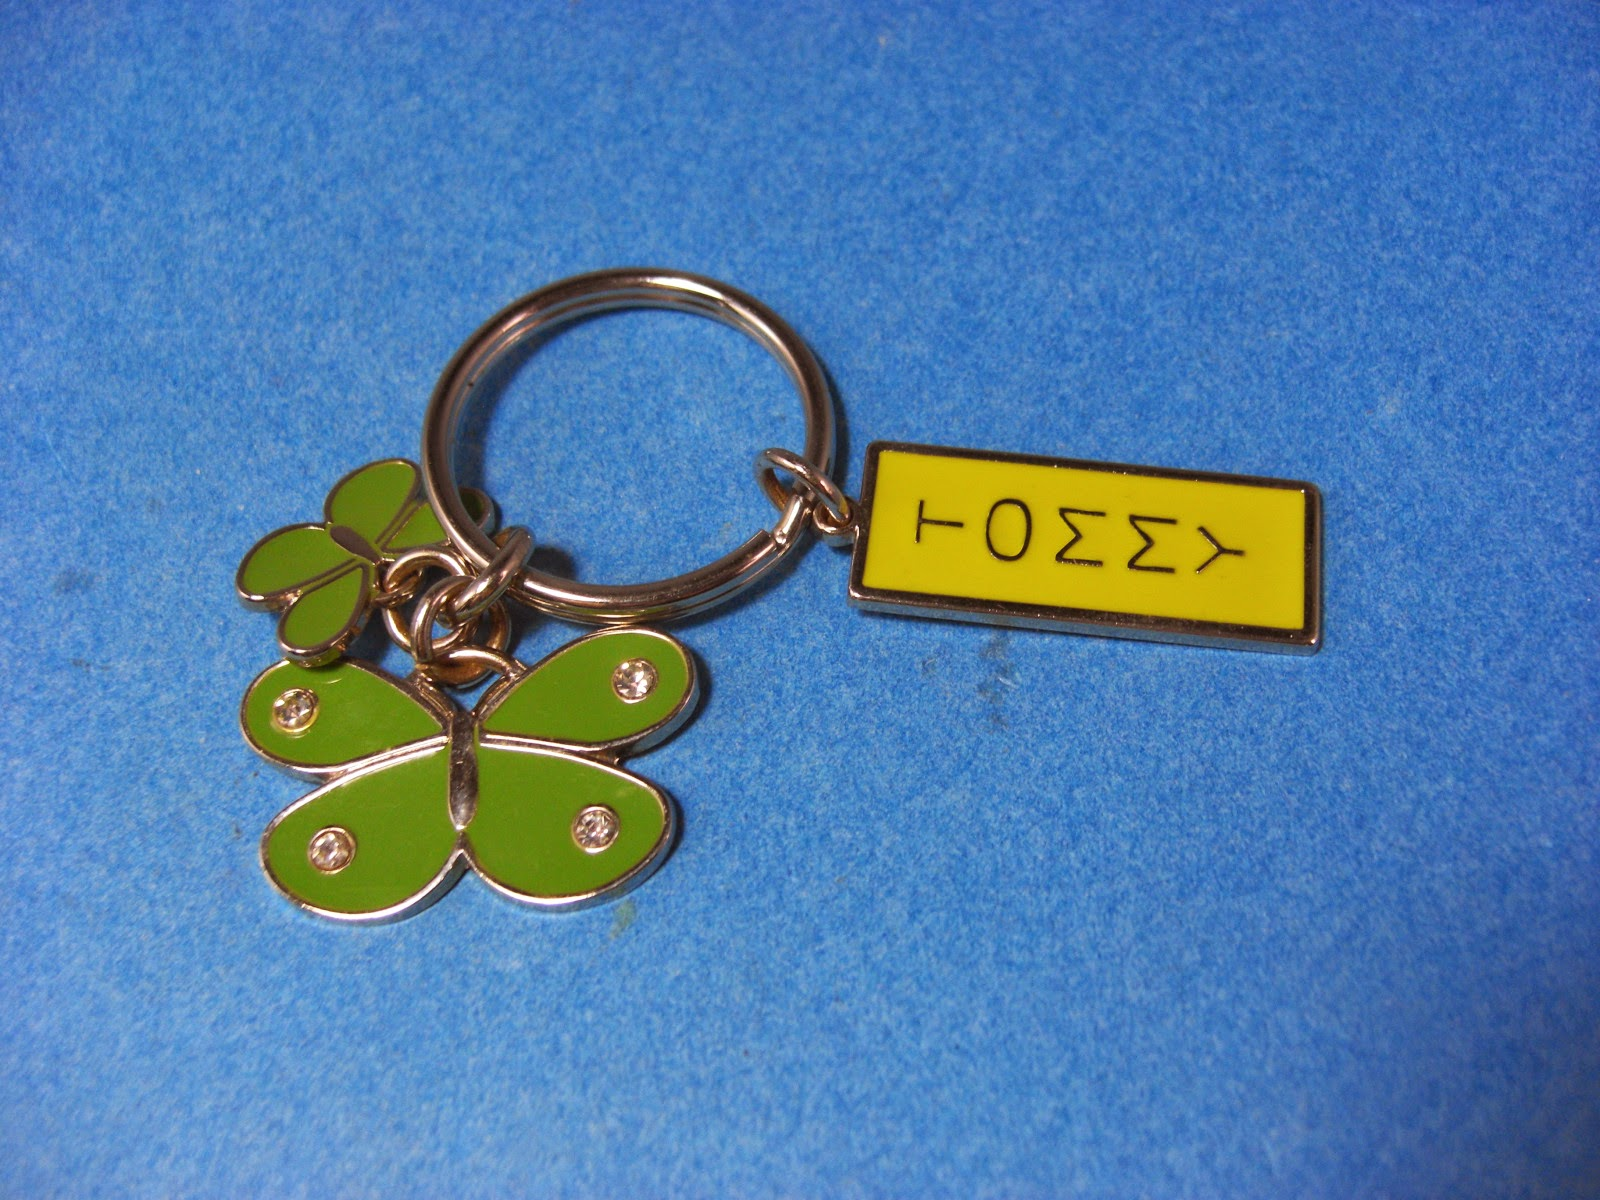 http://bargaincart.ecrater.com/p/22203354/tommy-hilfiger-silvertone-green-yellow